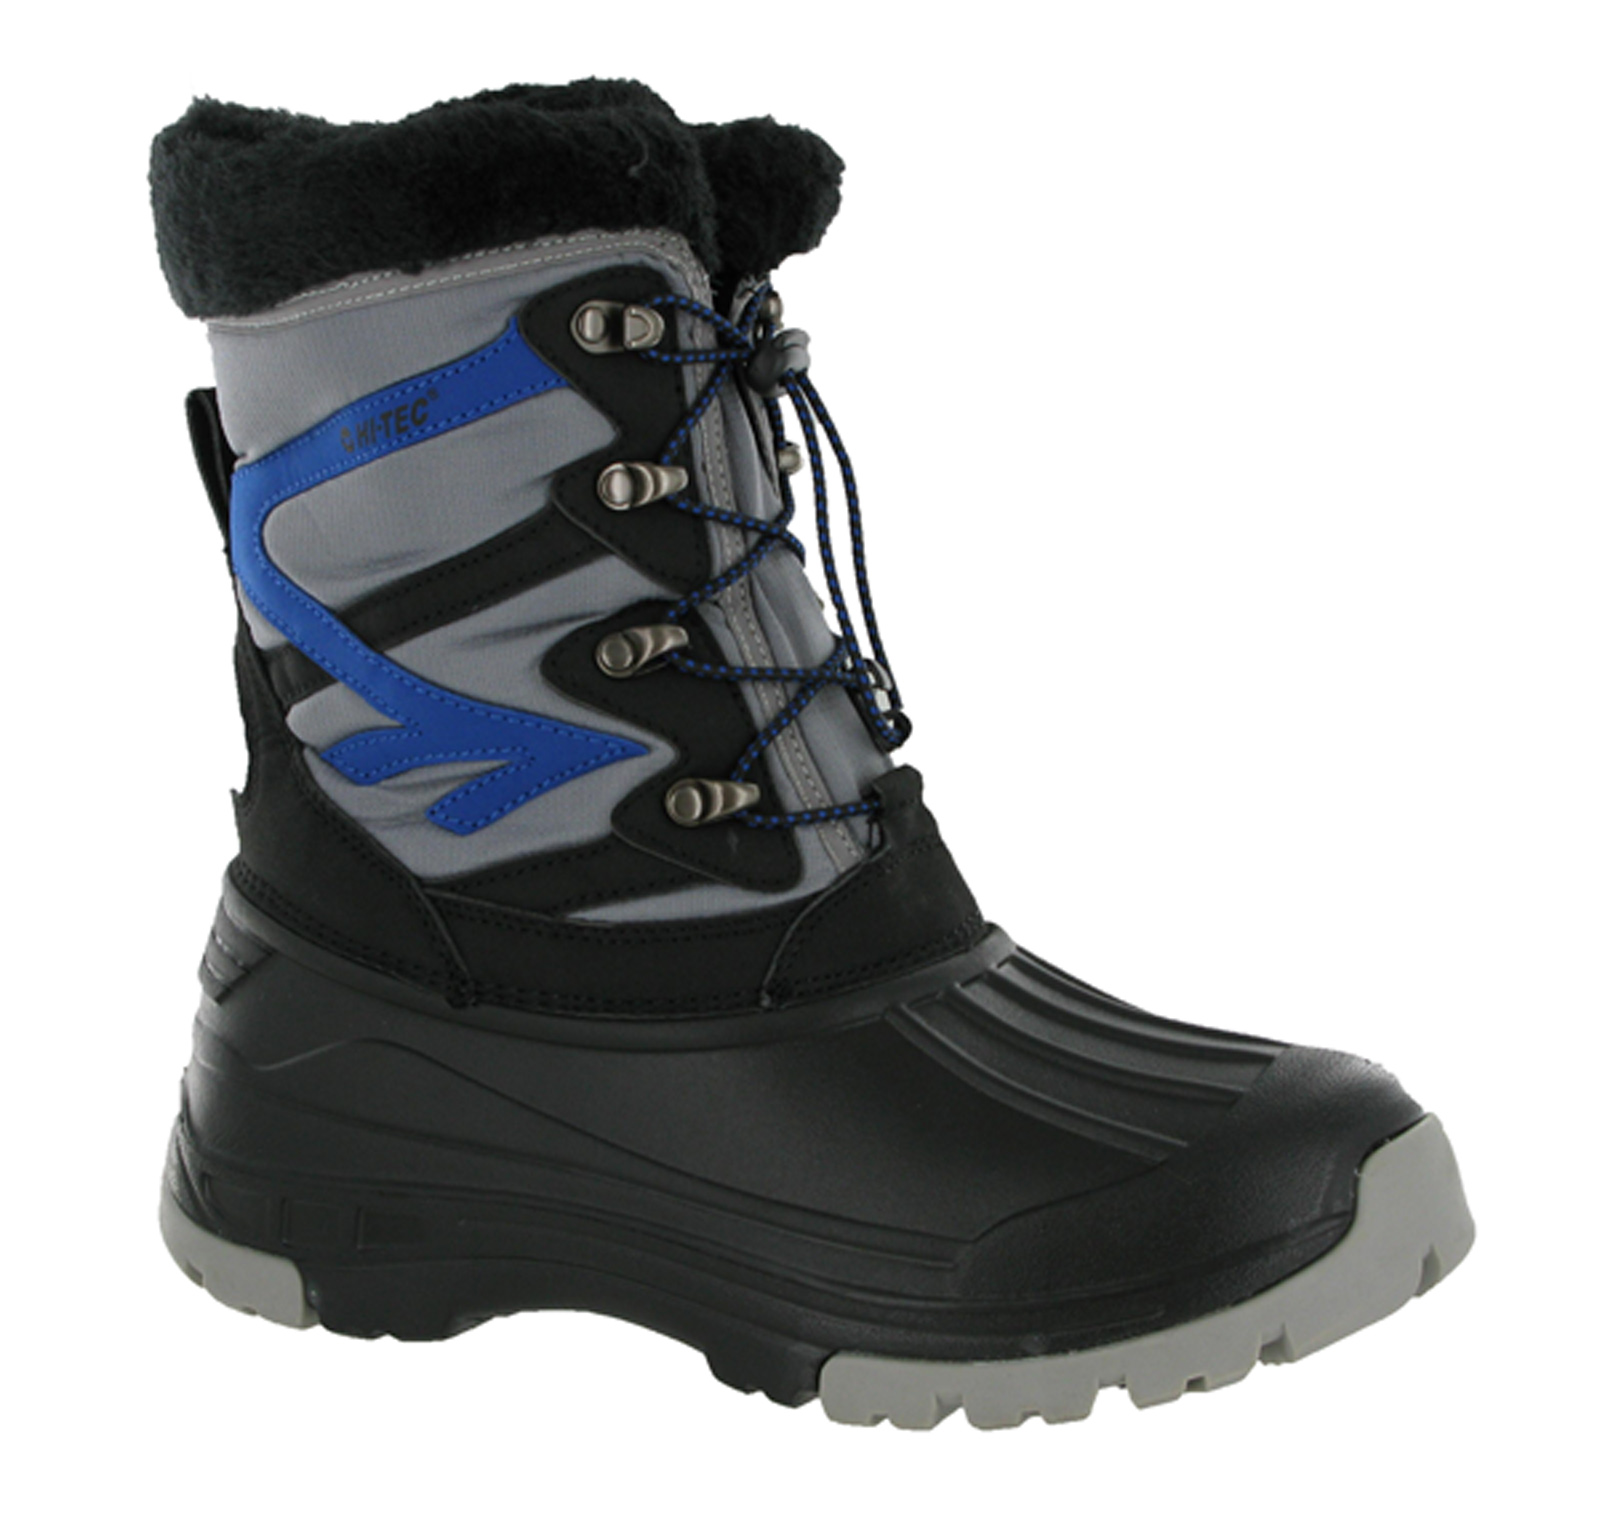 New Boys Hi Tec Avalanche Lightweight Winter Warm Comfy ...